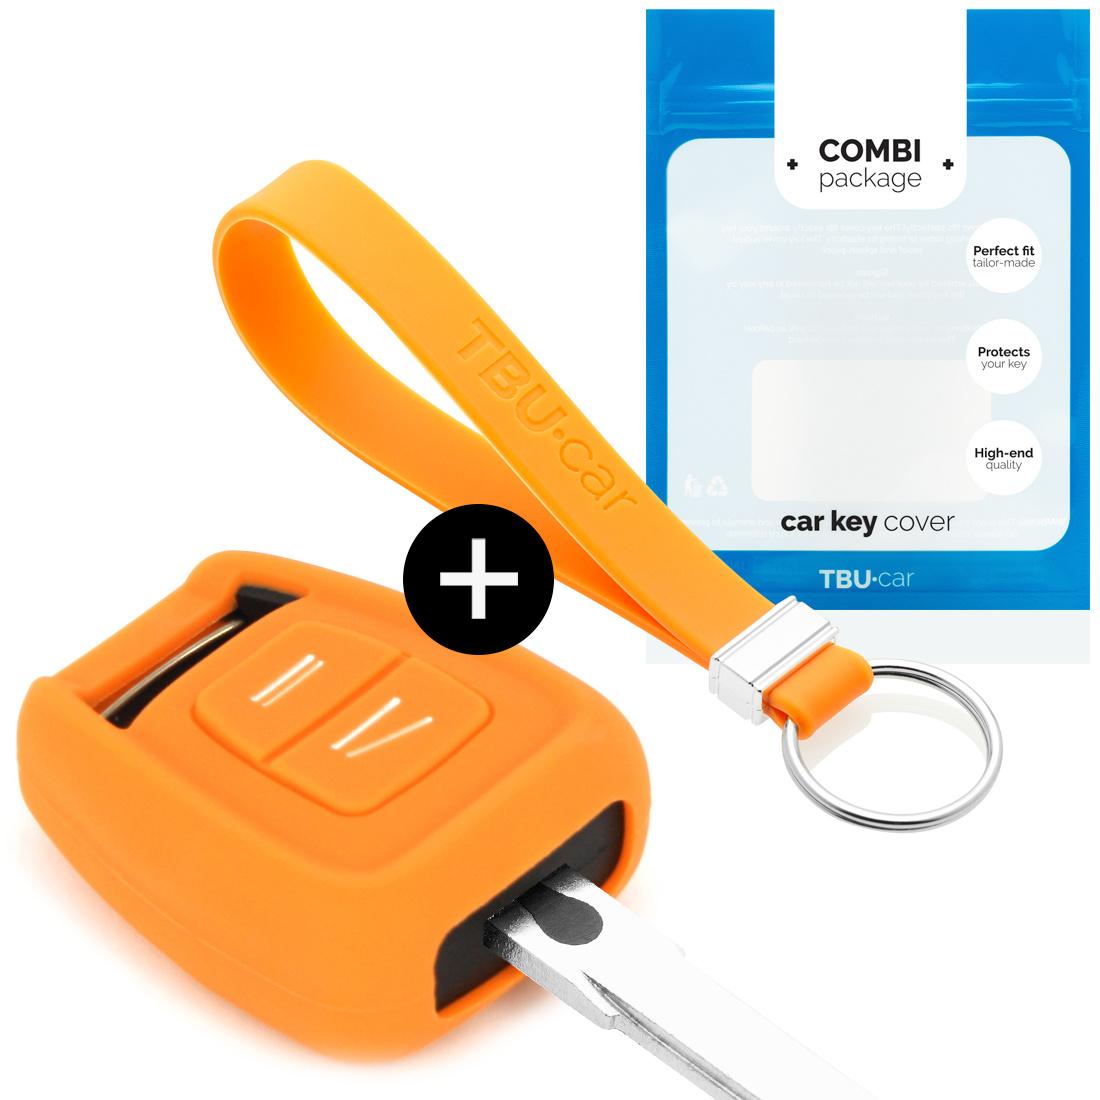 TBU car TBU car Autoschlüssel Hülle kompatibel mit Opel 2 Tasten - Schutzhülle aus Silikon - Auto Schlüsselhülle Cover in Orange